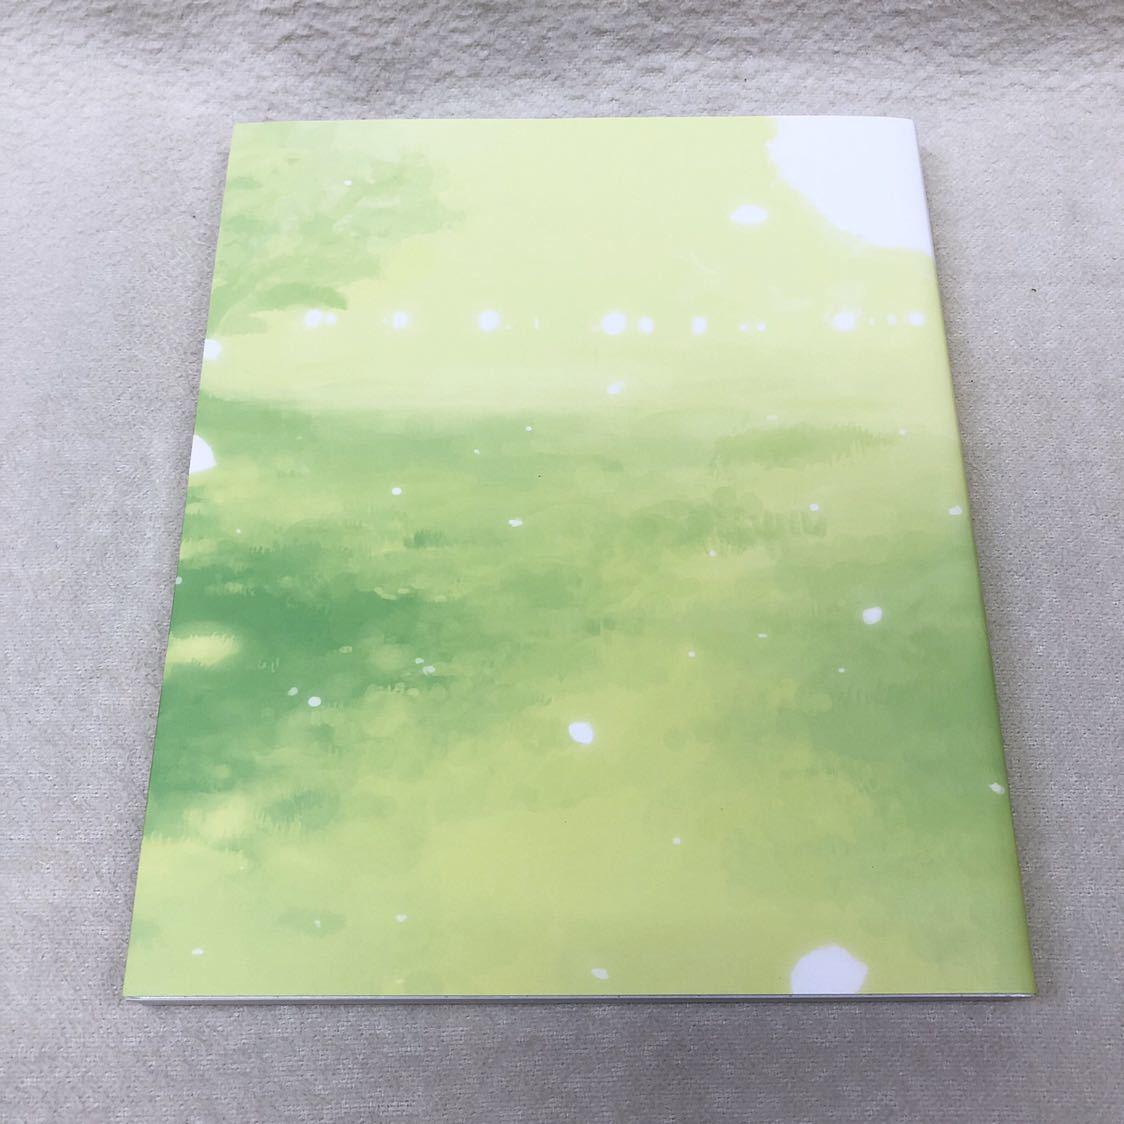 SAKURAMUSUBI VISUAL FANBOOK さくらむすび ビジュアル ファンブック_画像2